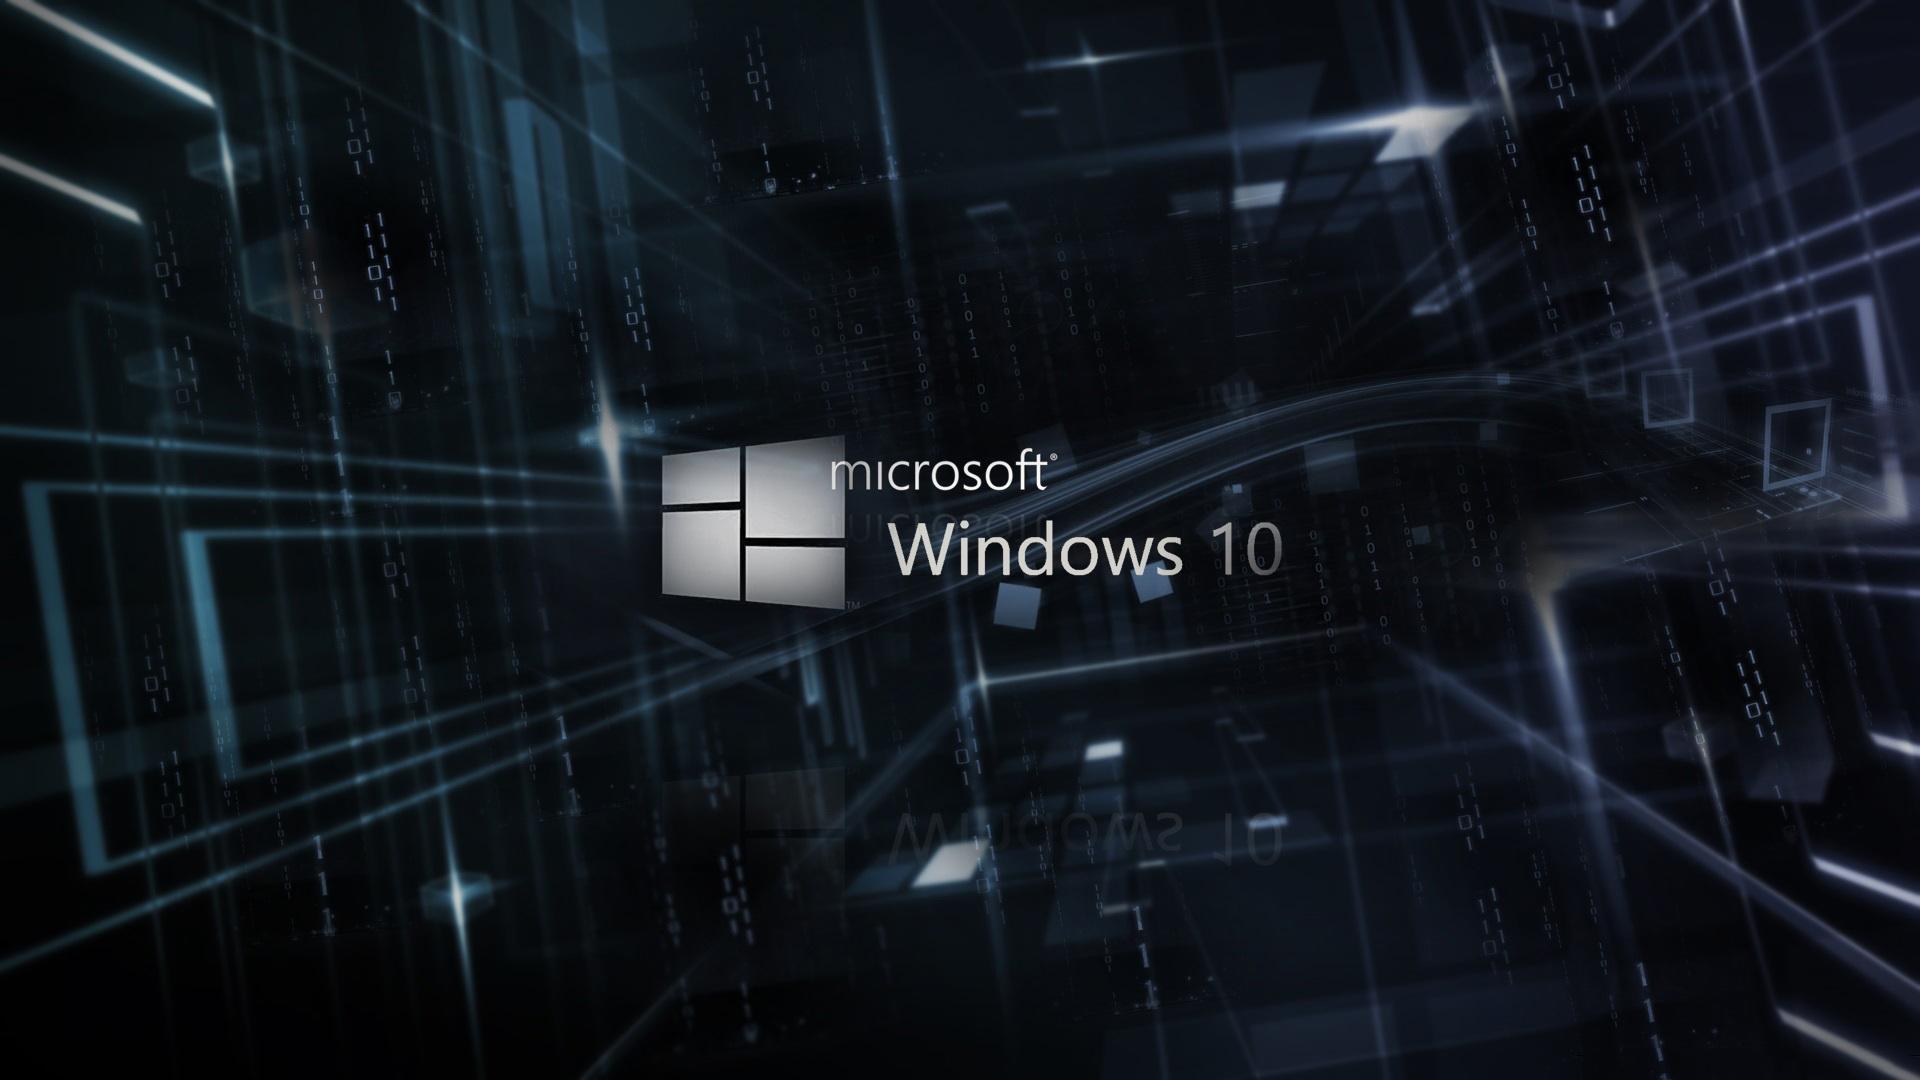 windows 10 wallpaper hd | pixelstalk